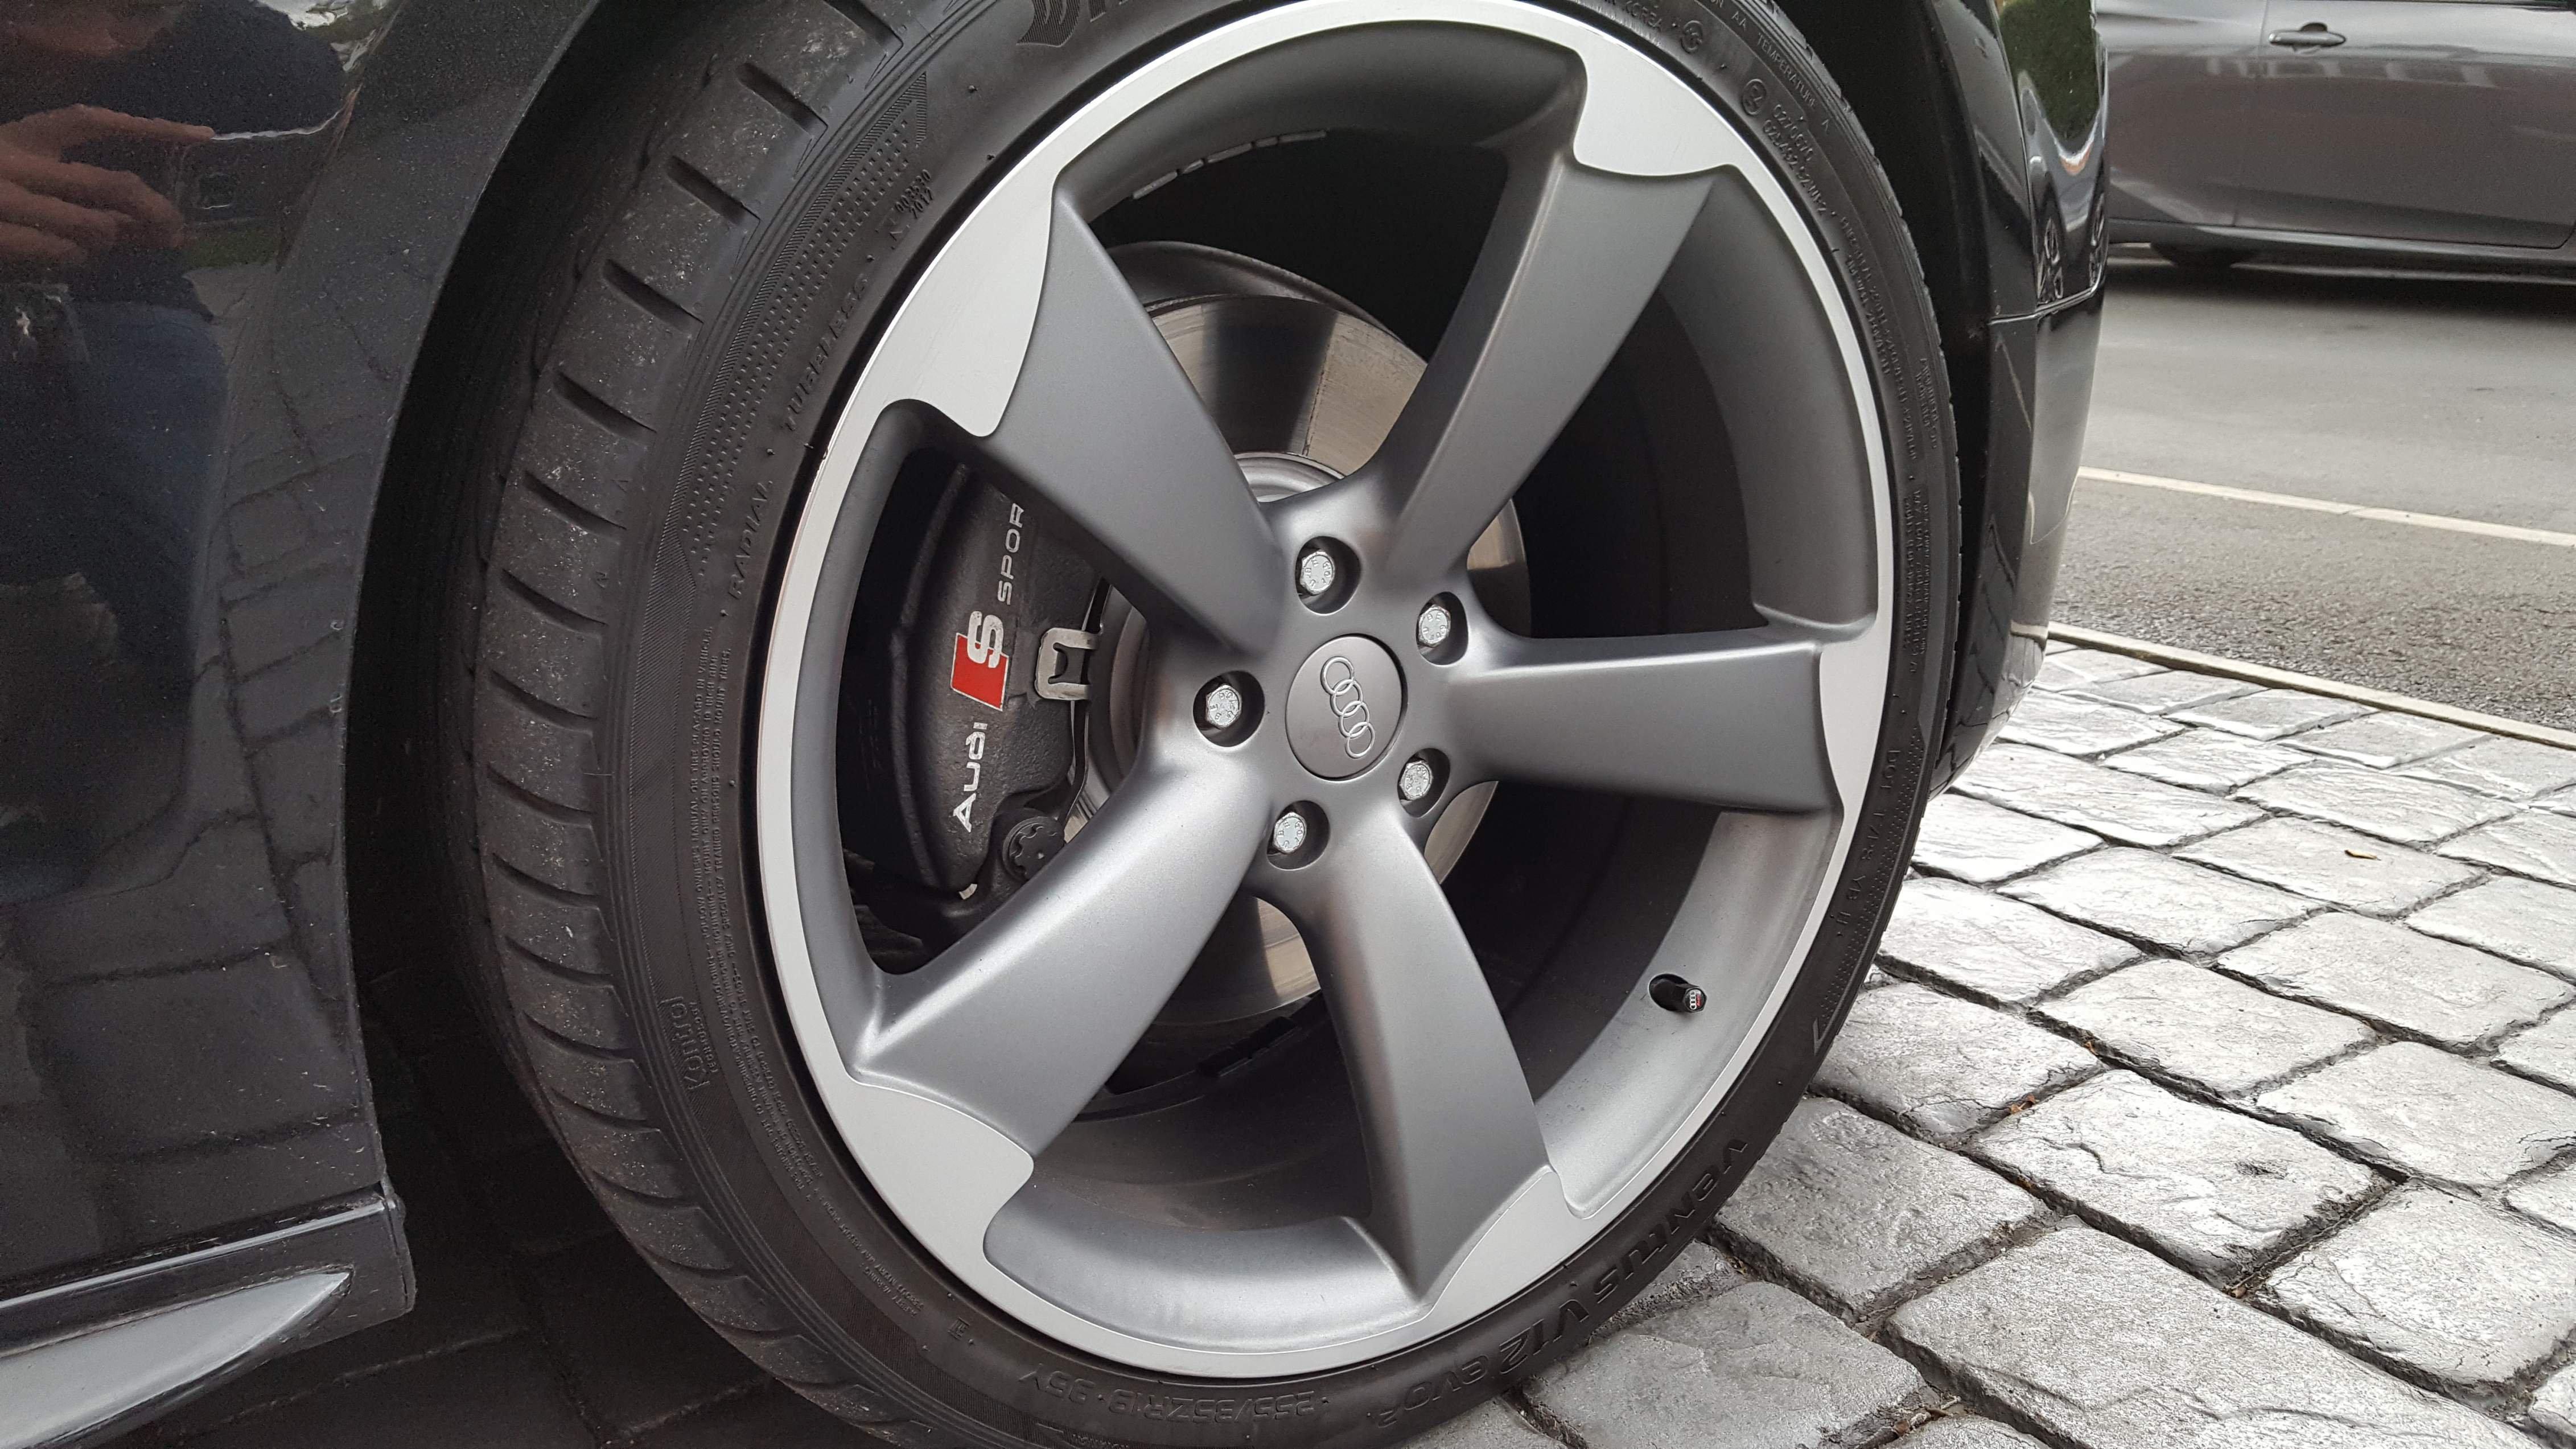 Brake Caliper What Colour Audi A5 Forum Audi S5 Forum